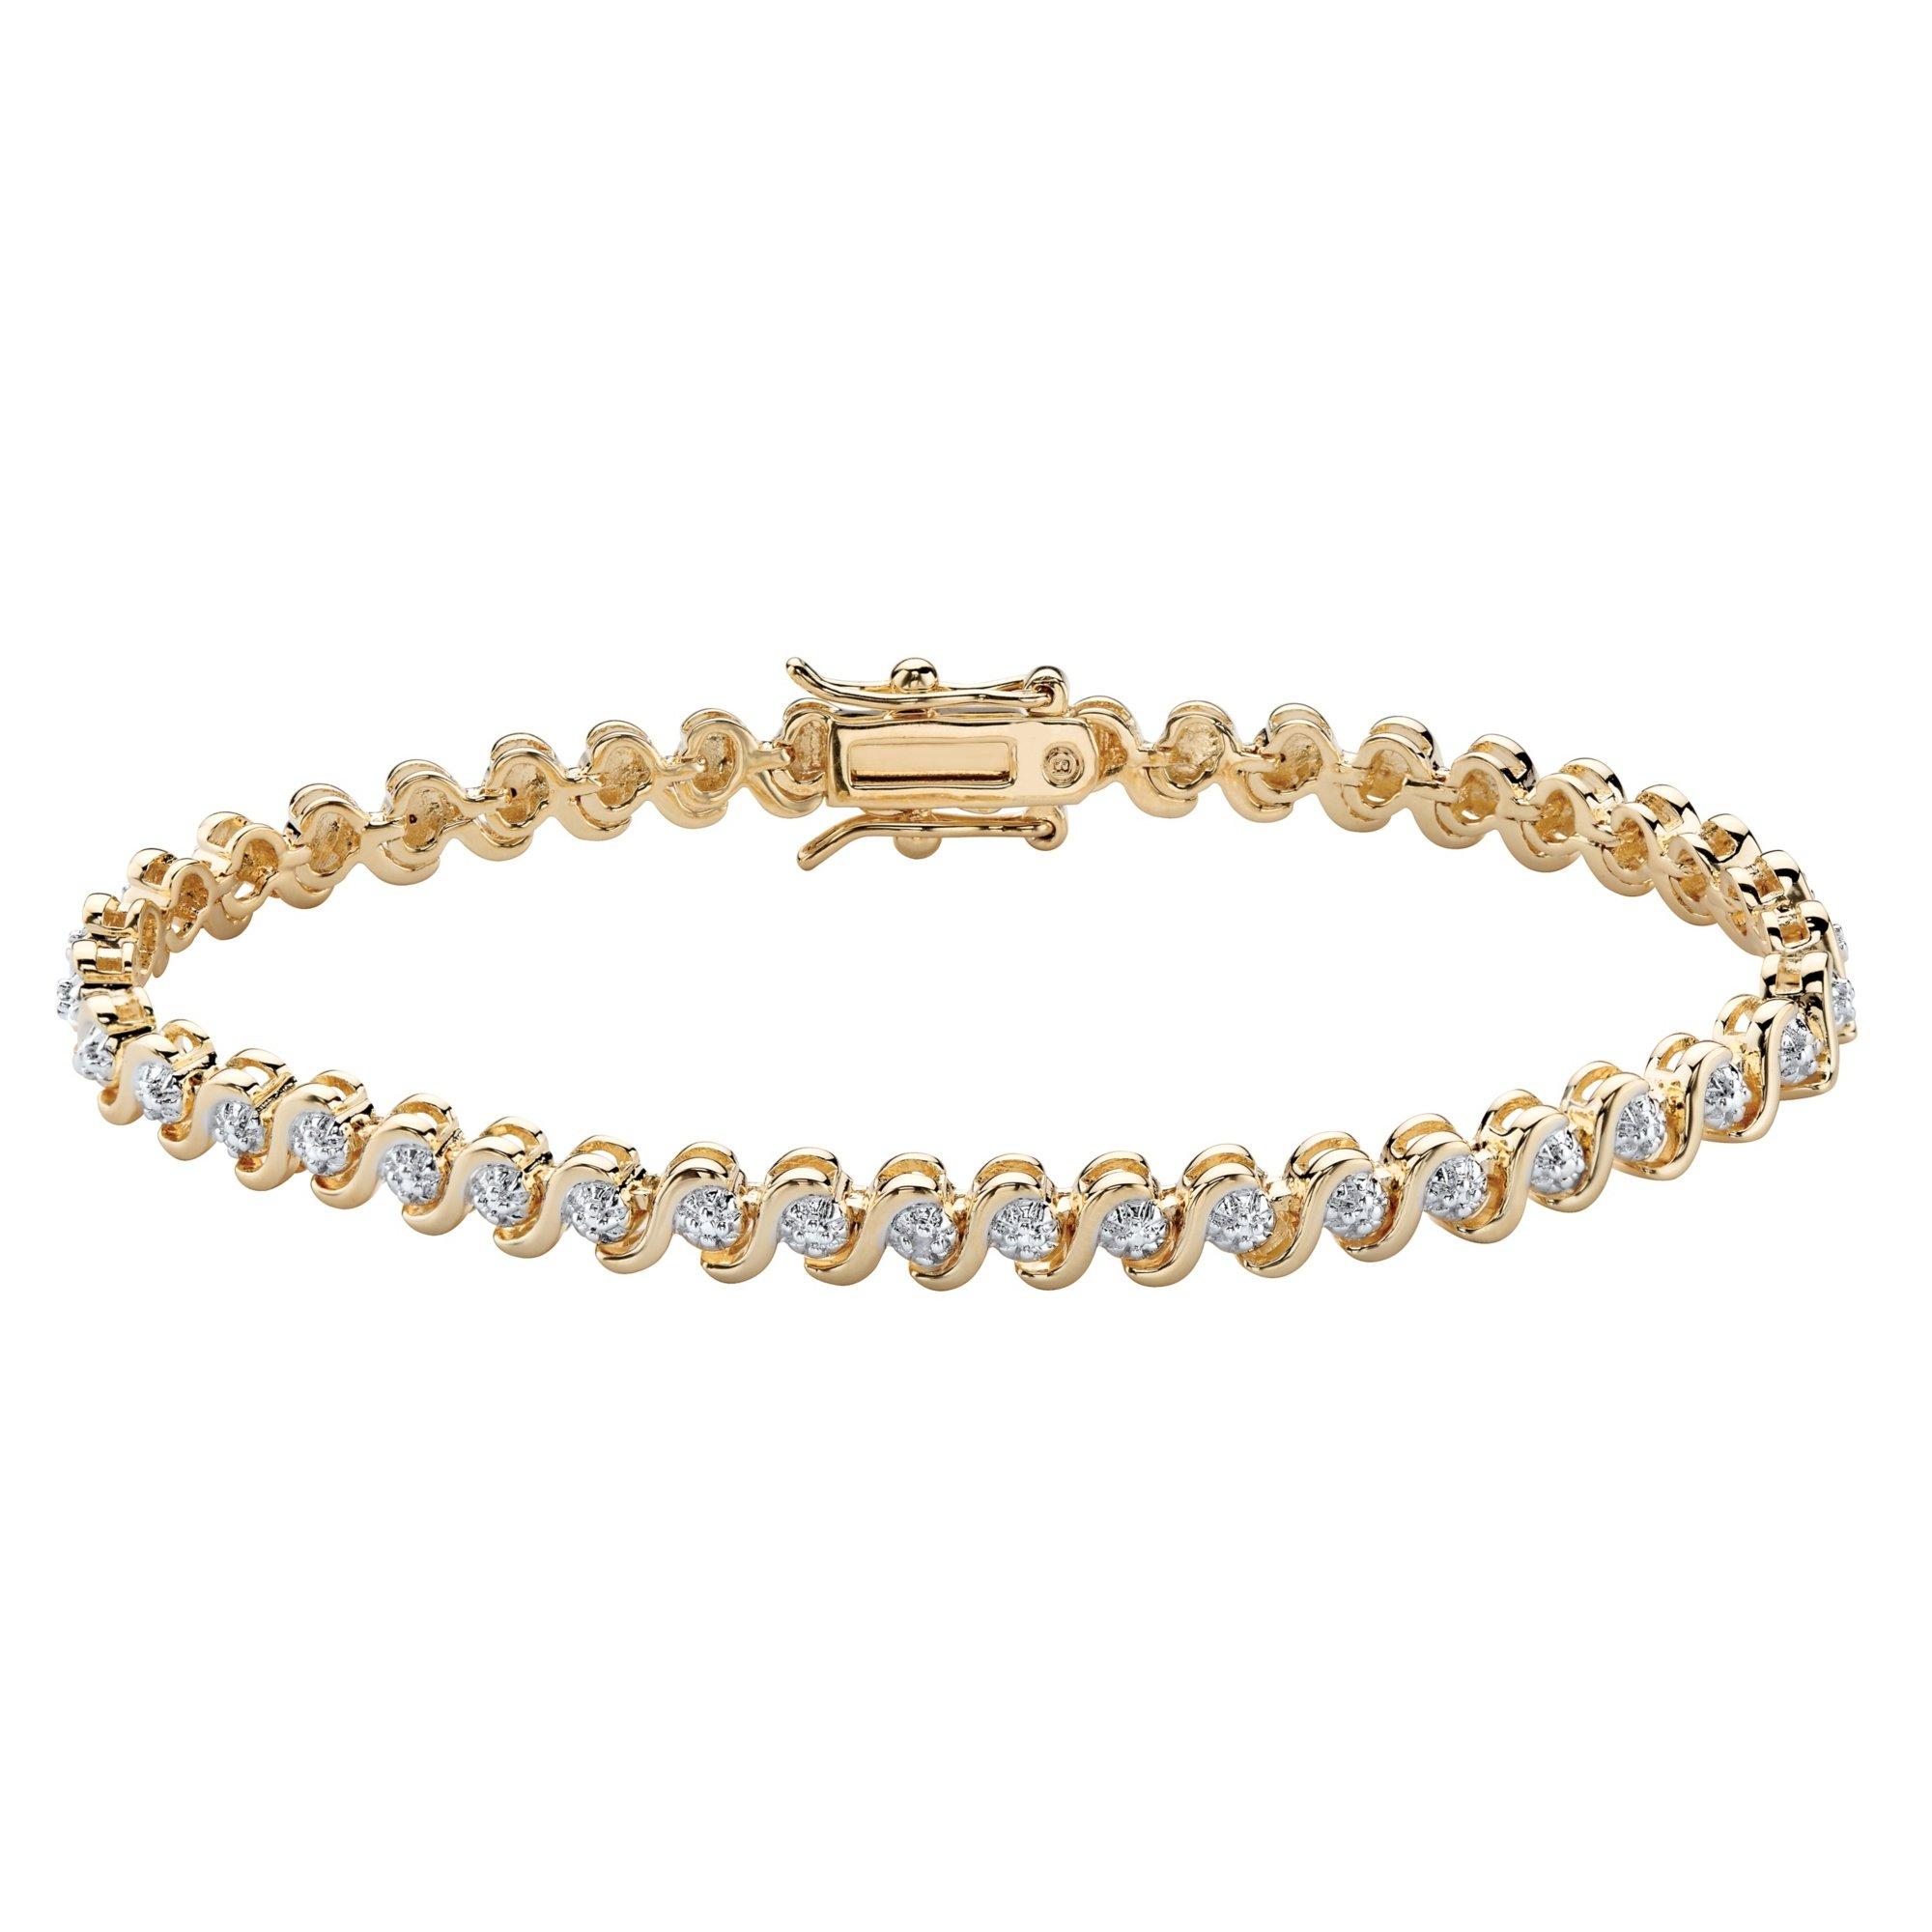 Palm Beach Jewelry Round White Diamond Accent S-Link Tennis Bracelet 18k Yellow Gold-Plated 7.5''